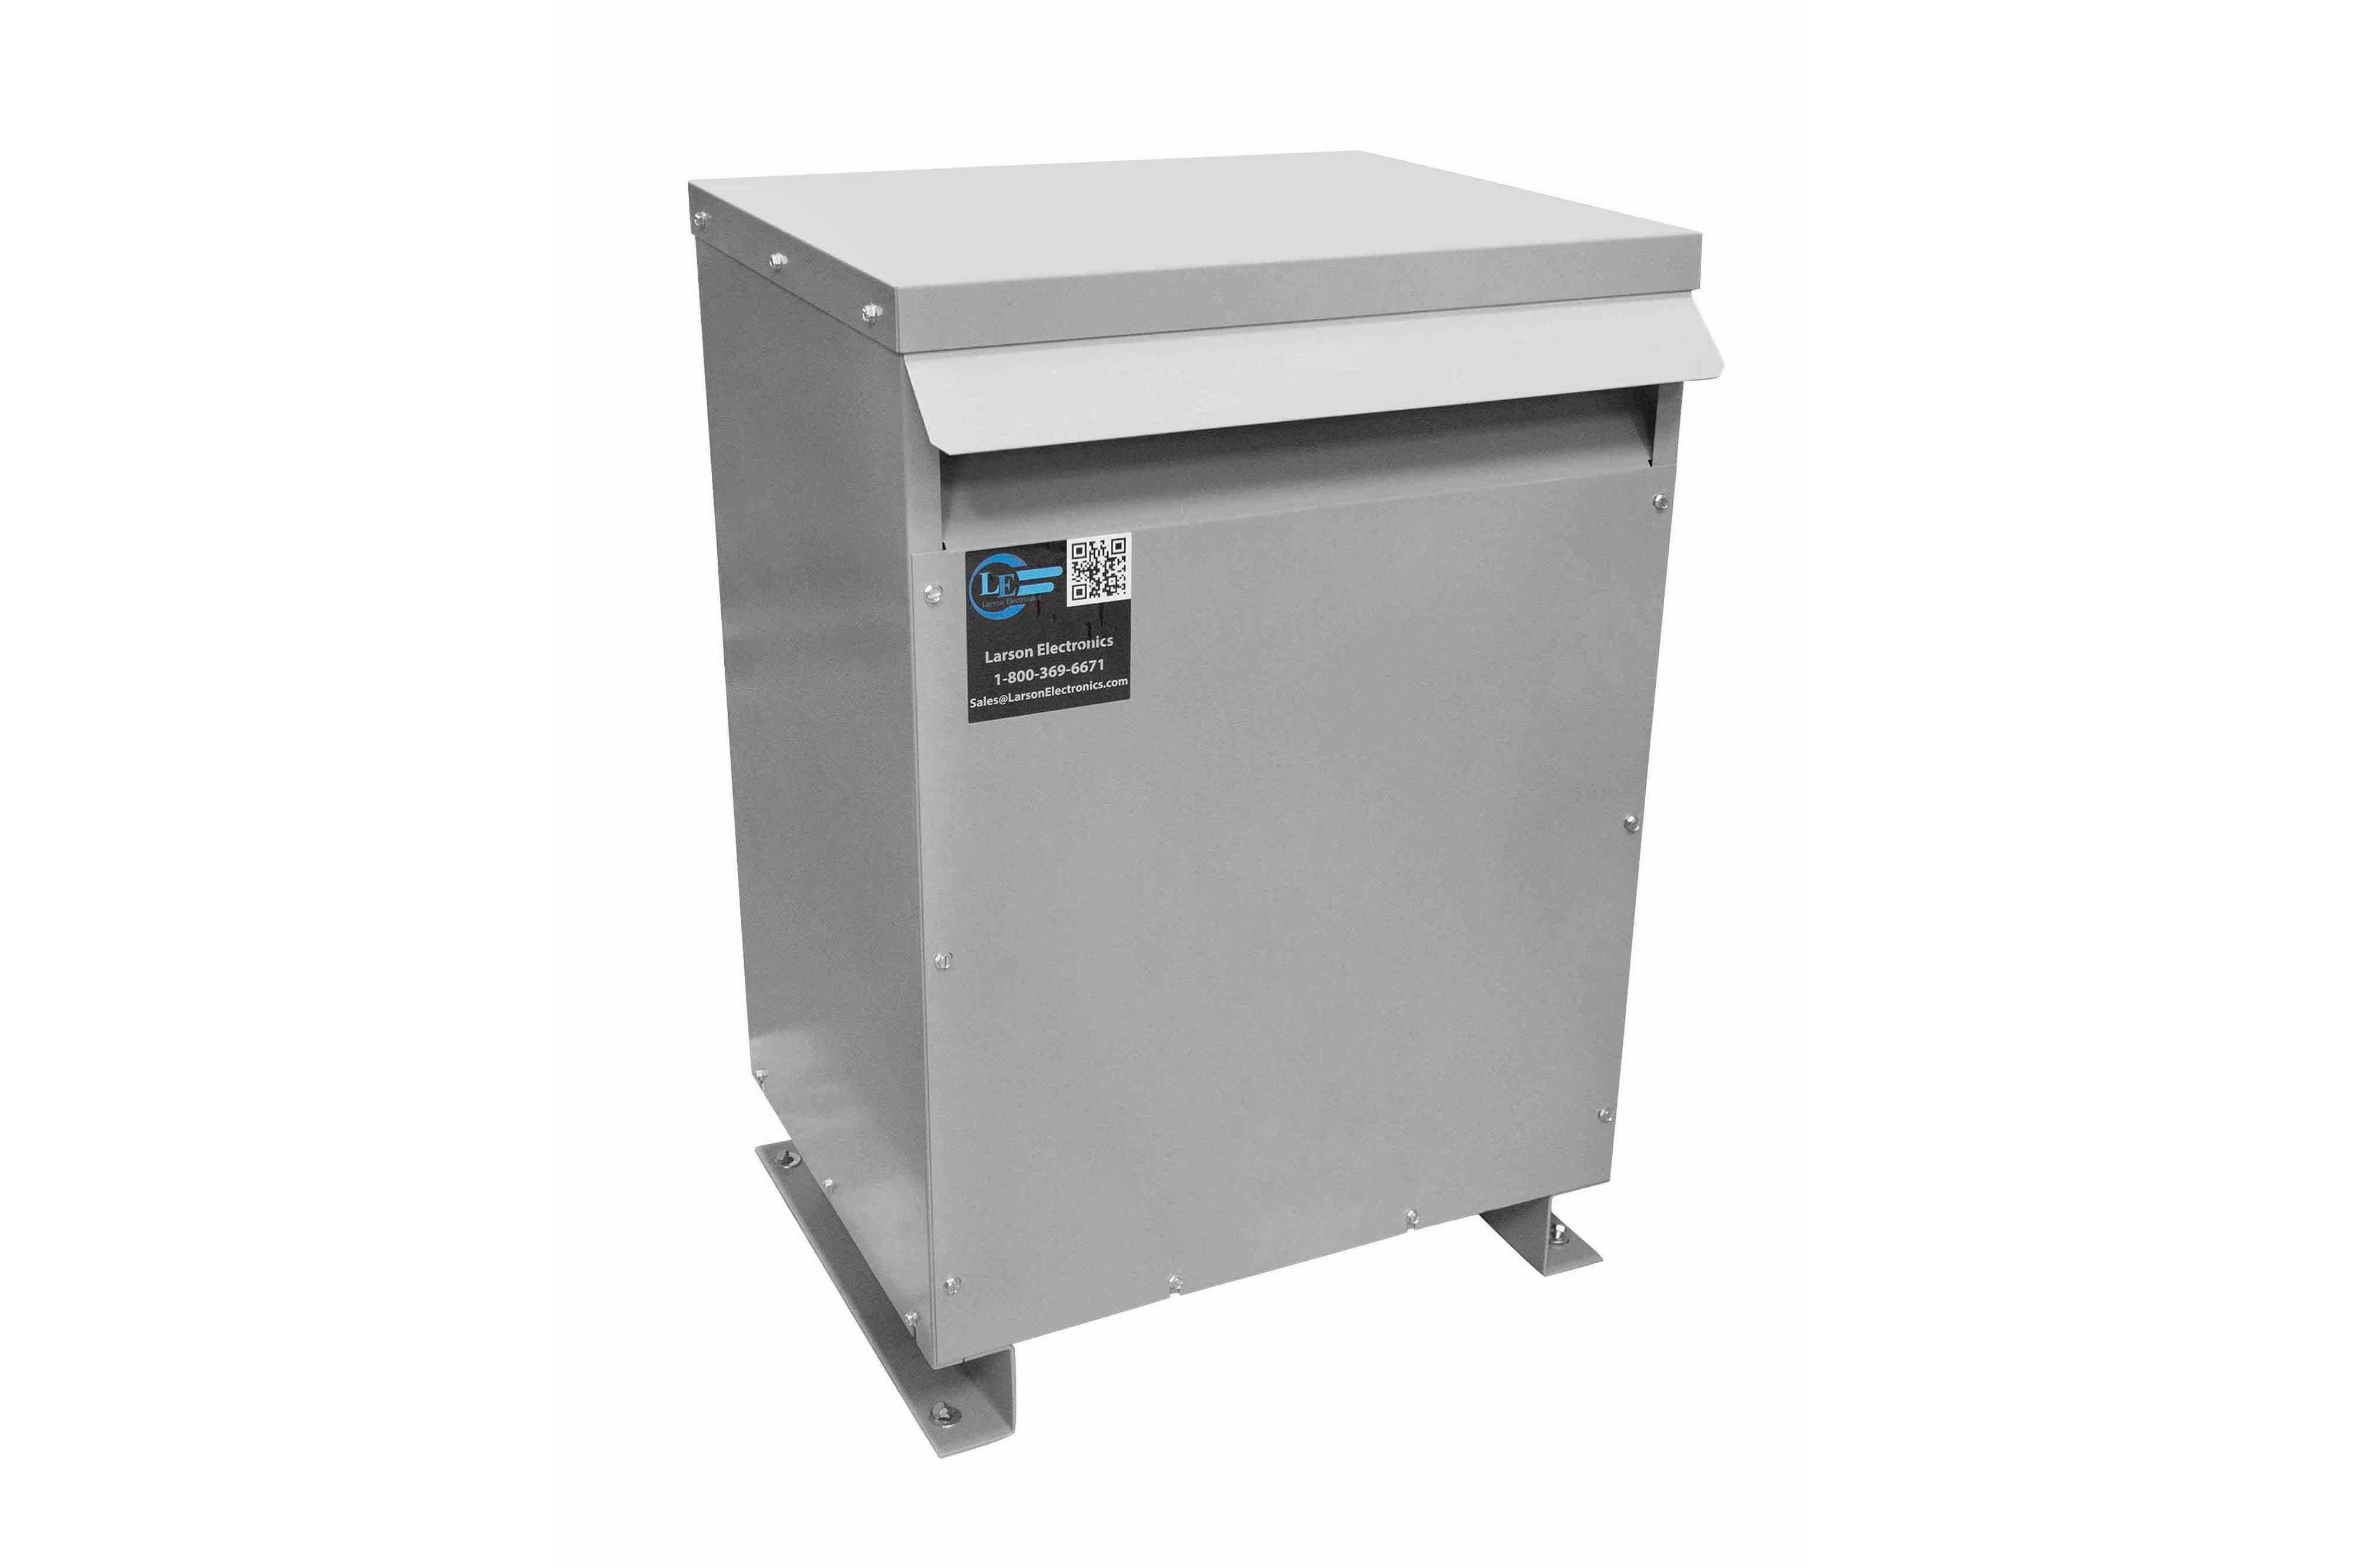 26 kVA 3PH Isolation Transformer, 208V Wye Primary, 208Y/120 Wye-N Secondary, N3R, Ventilated, 60 Hz